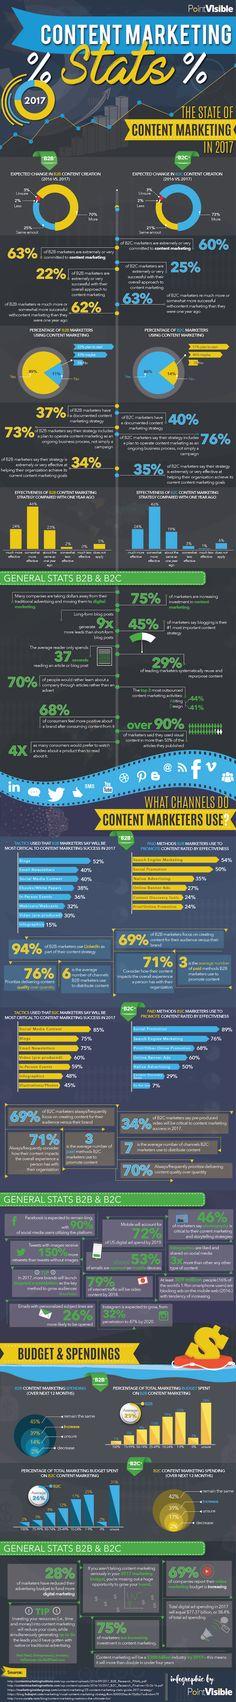 Mastering content marketing